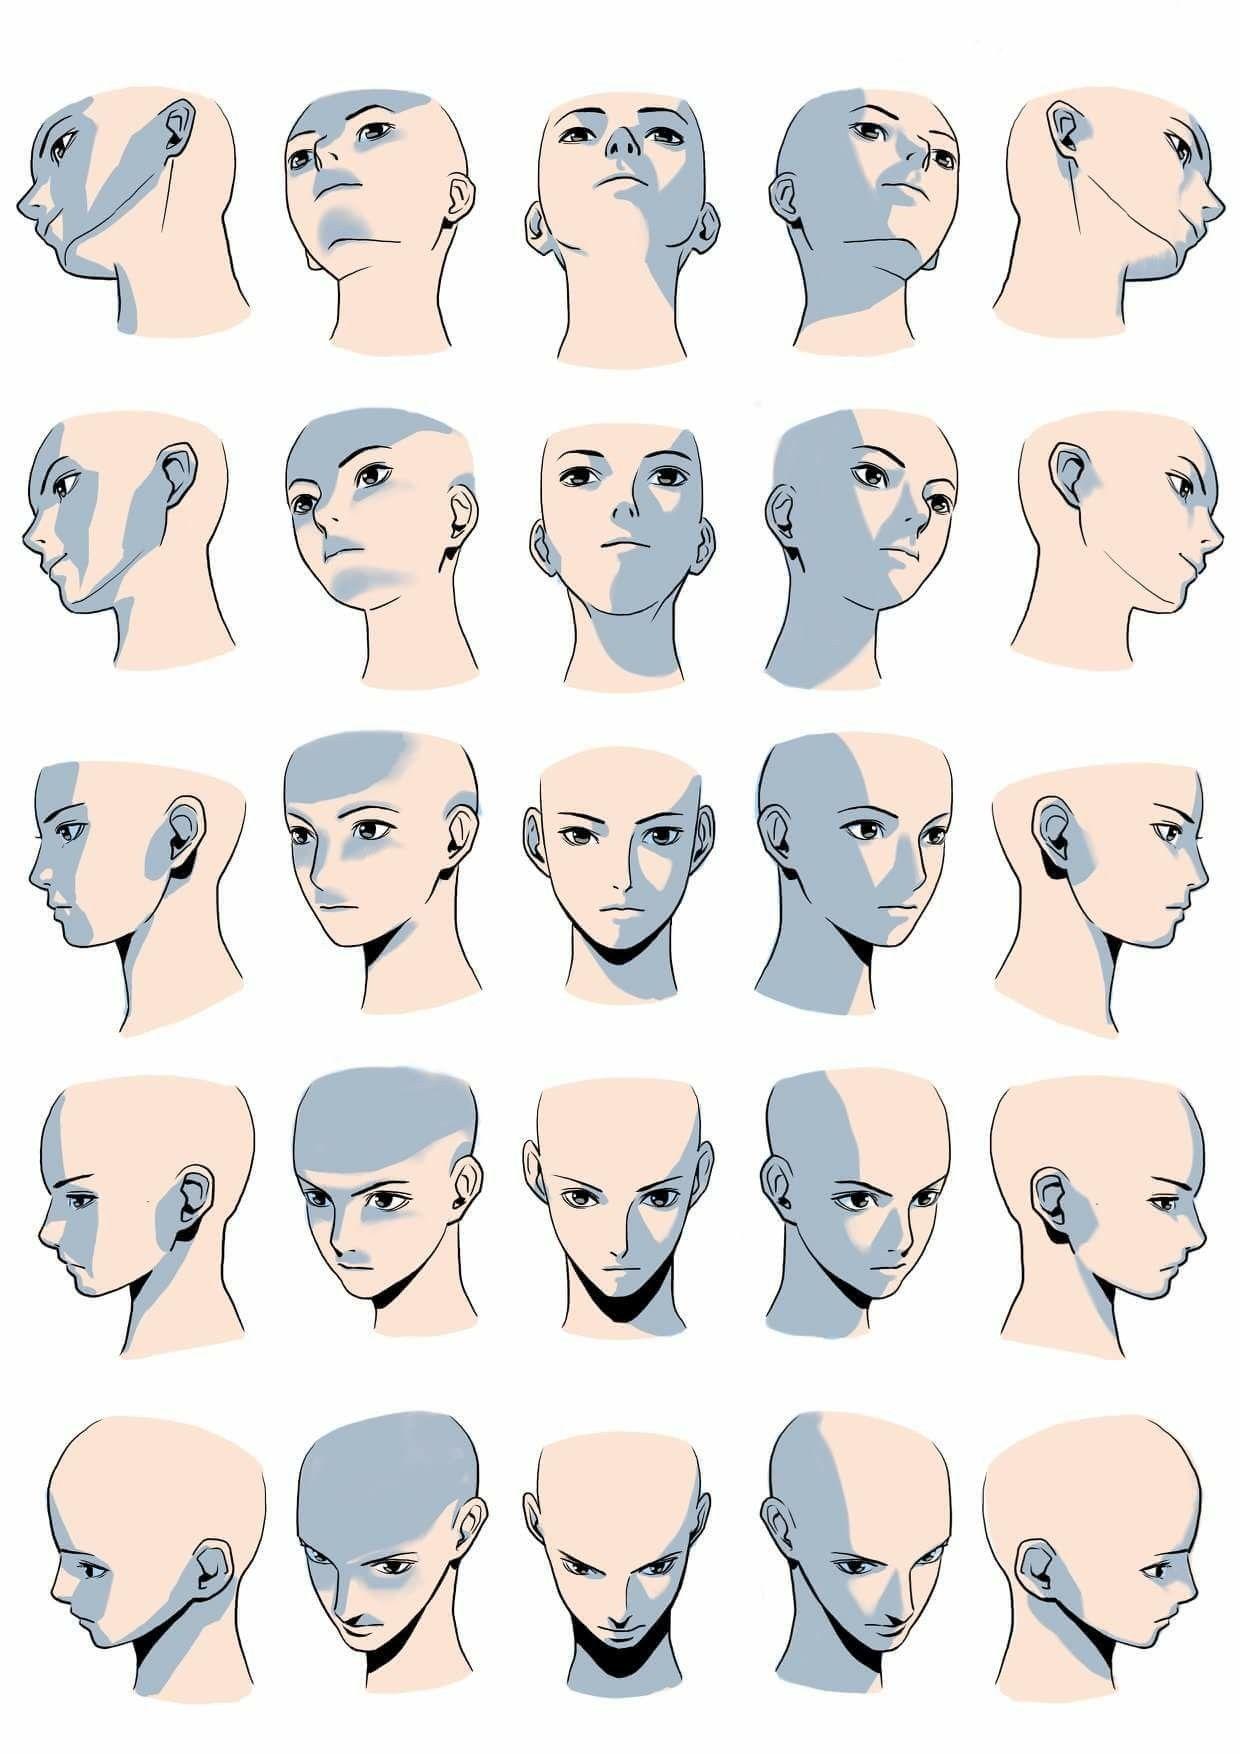 Belajar sketsa Gambar tubuh, Gambar wajah, Menggambar kepala